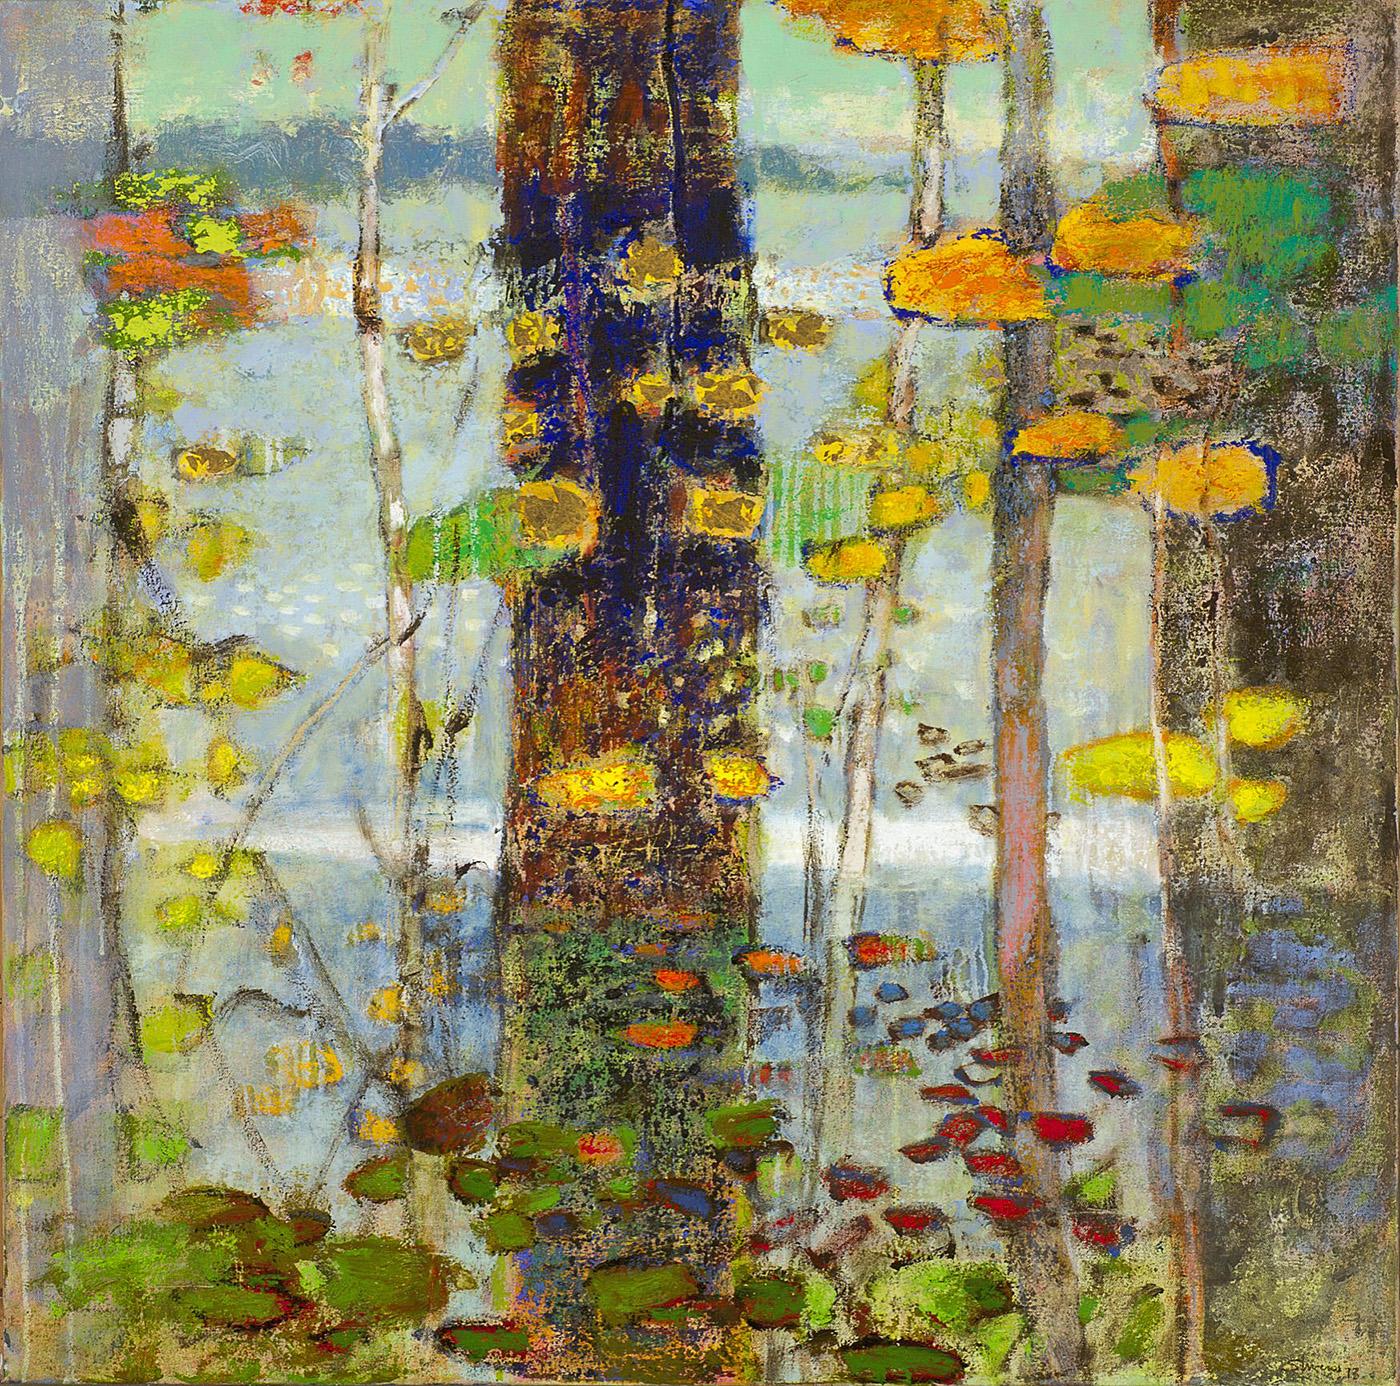 "Lakeshore Motif     oil on canvas   32 x 32""   2014"